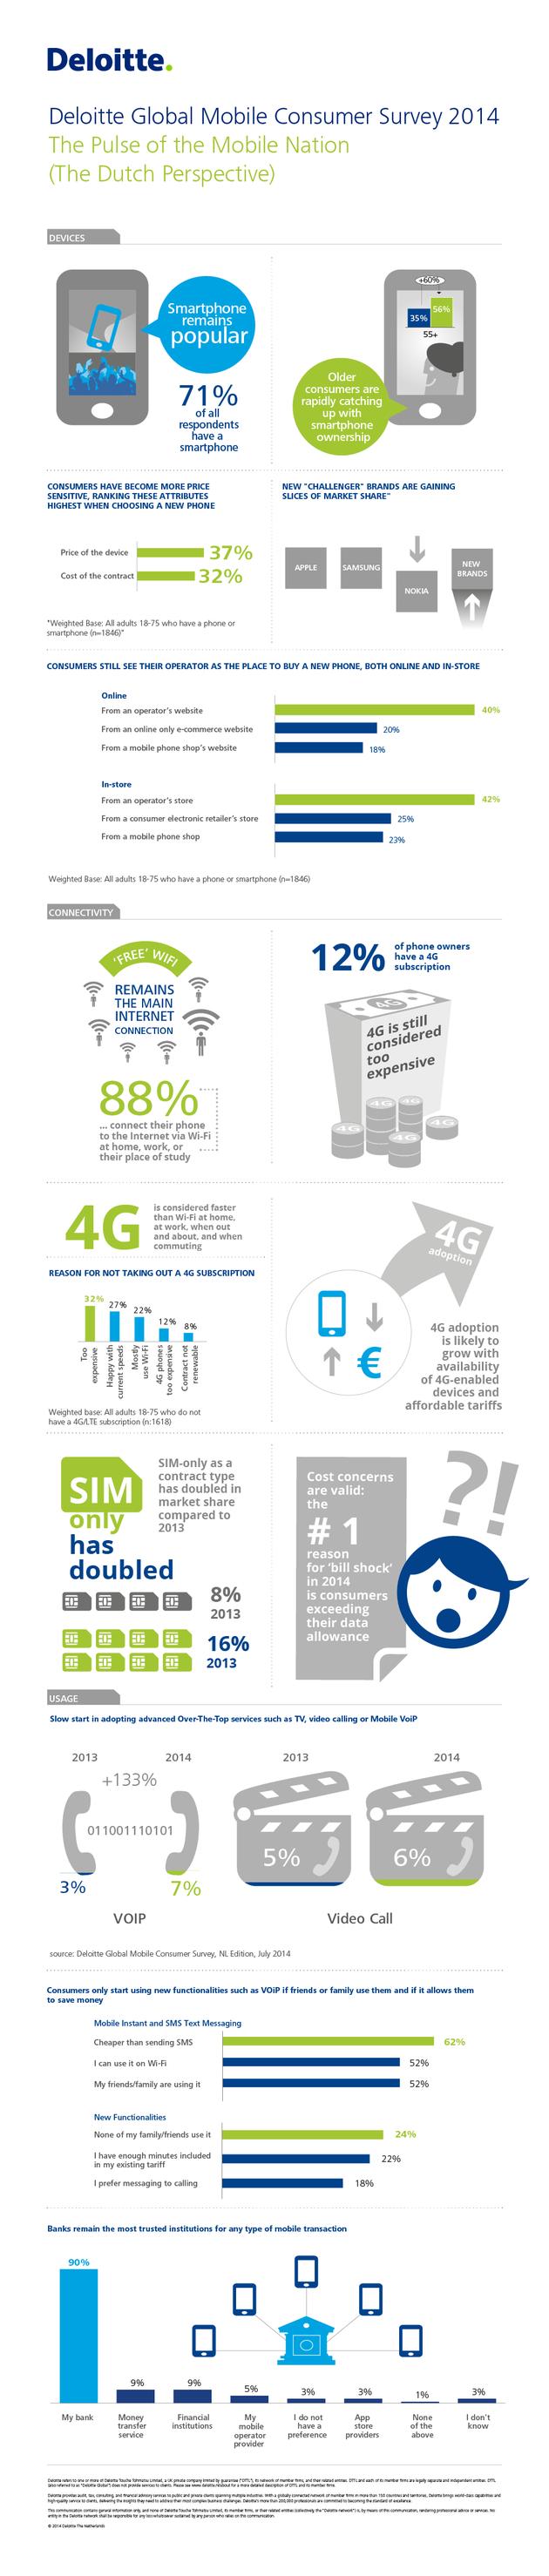 nl-tmt-gmcs-infographic-desktop